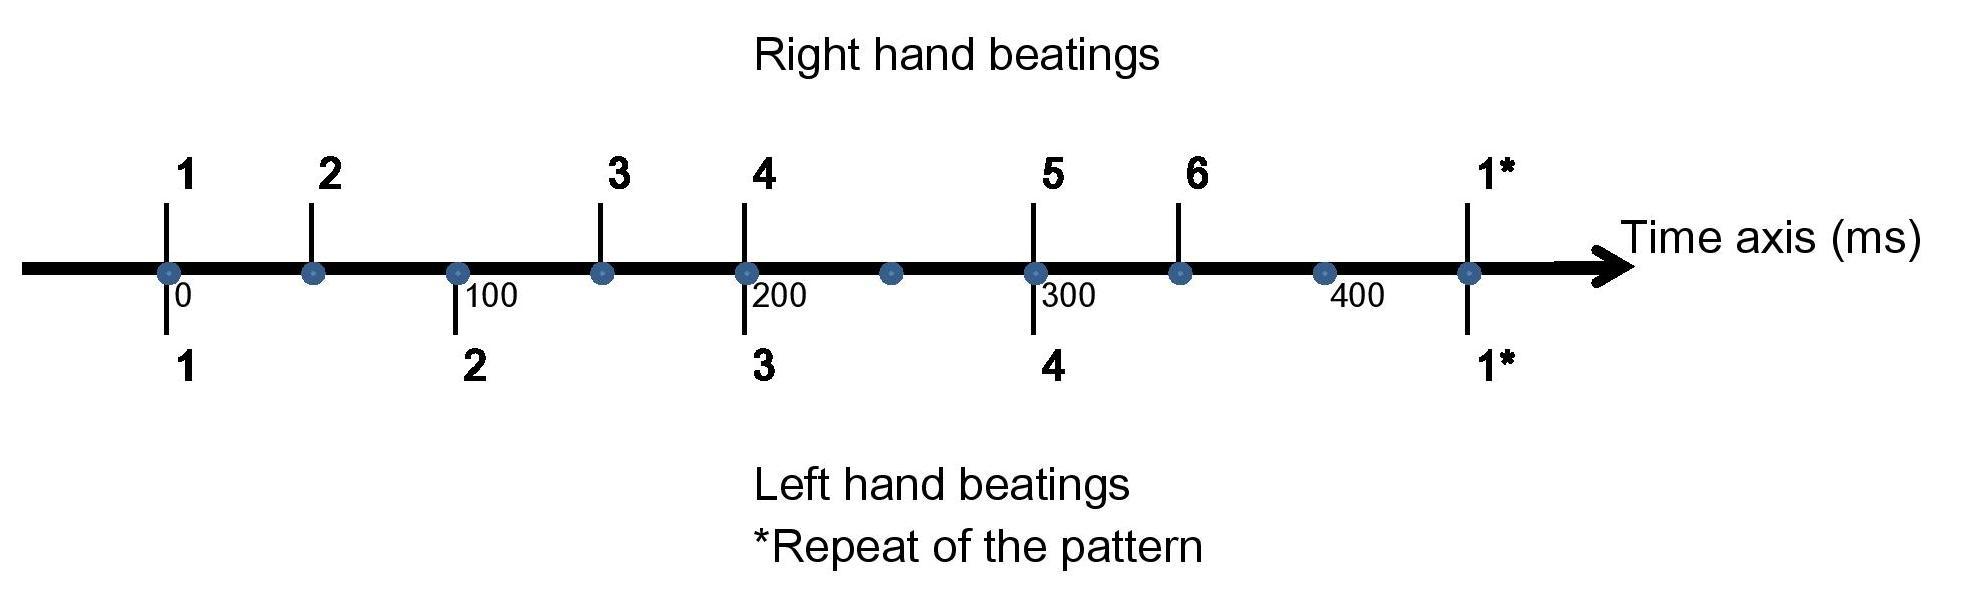 Barica Left Hand Beatings